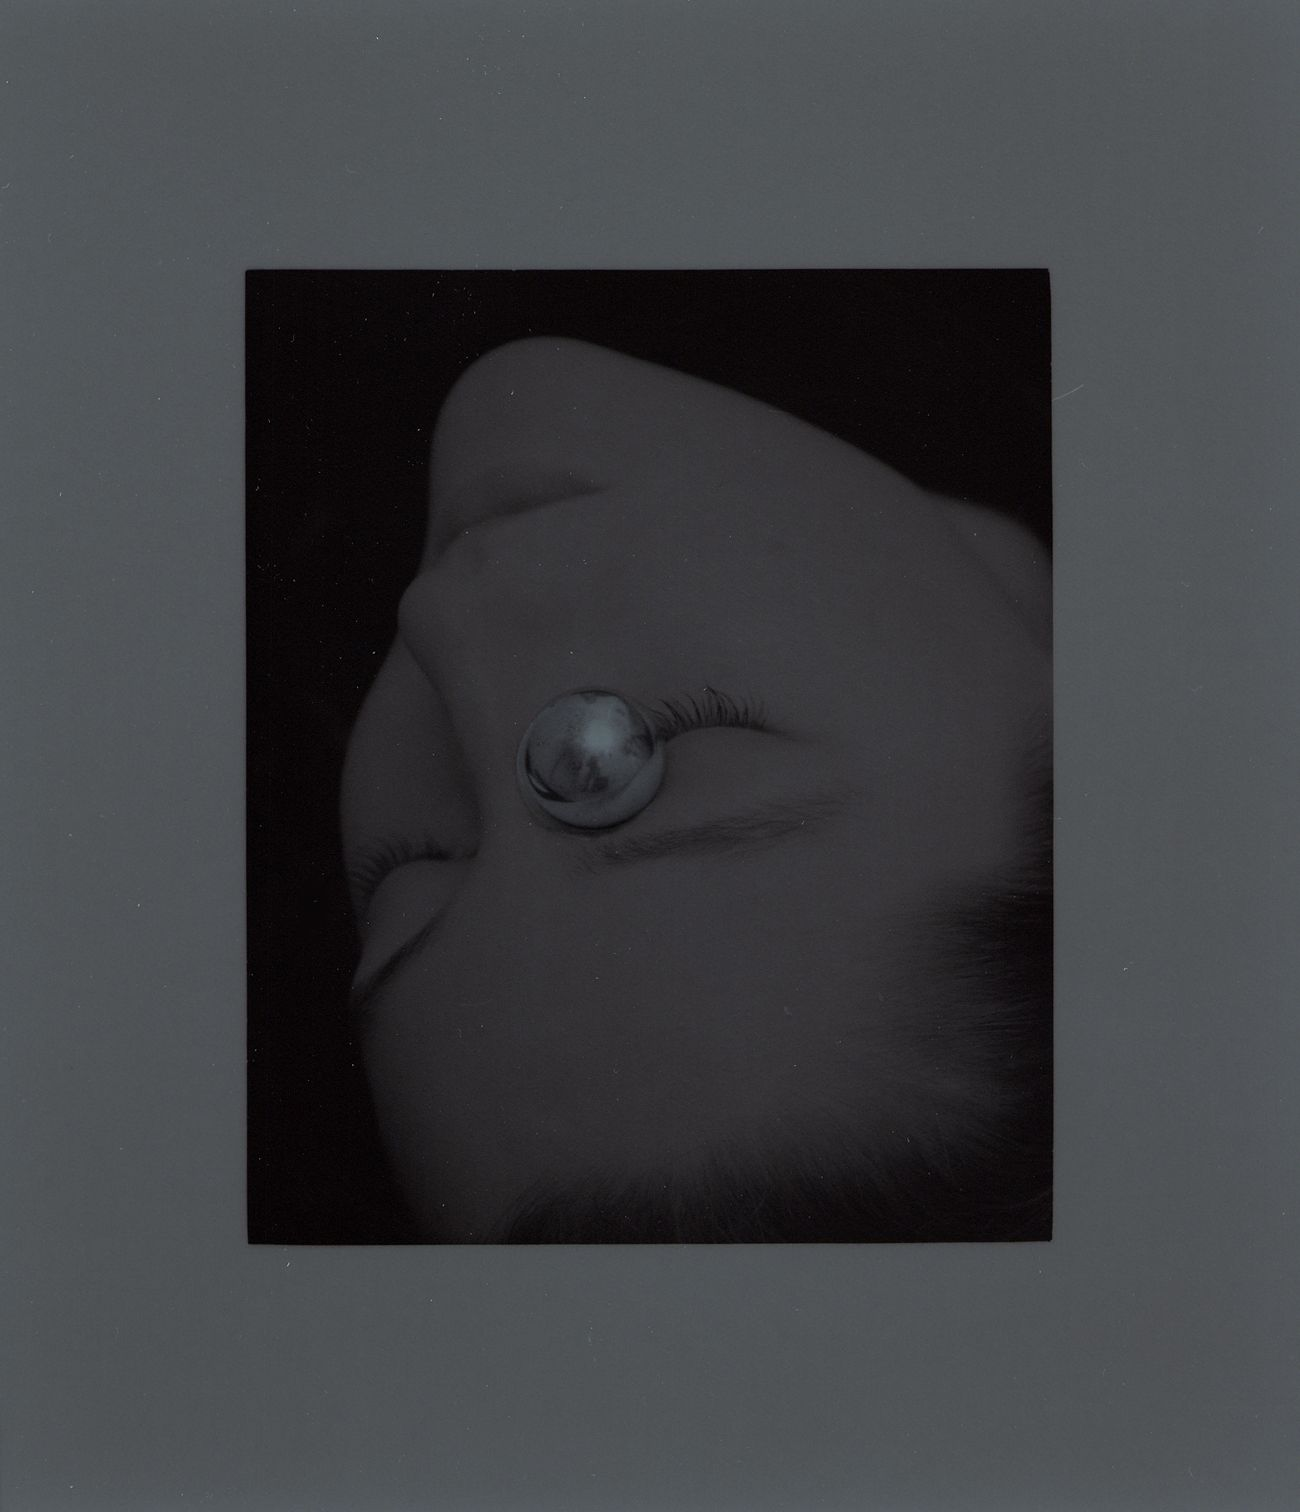 Patrick Bailly-Maître-Grand, Coma, 2001